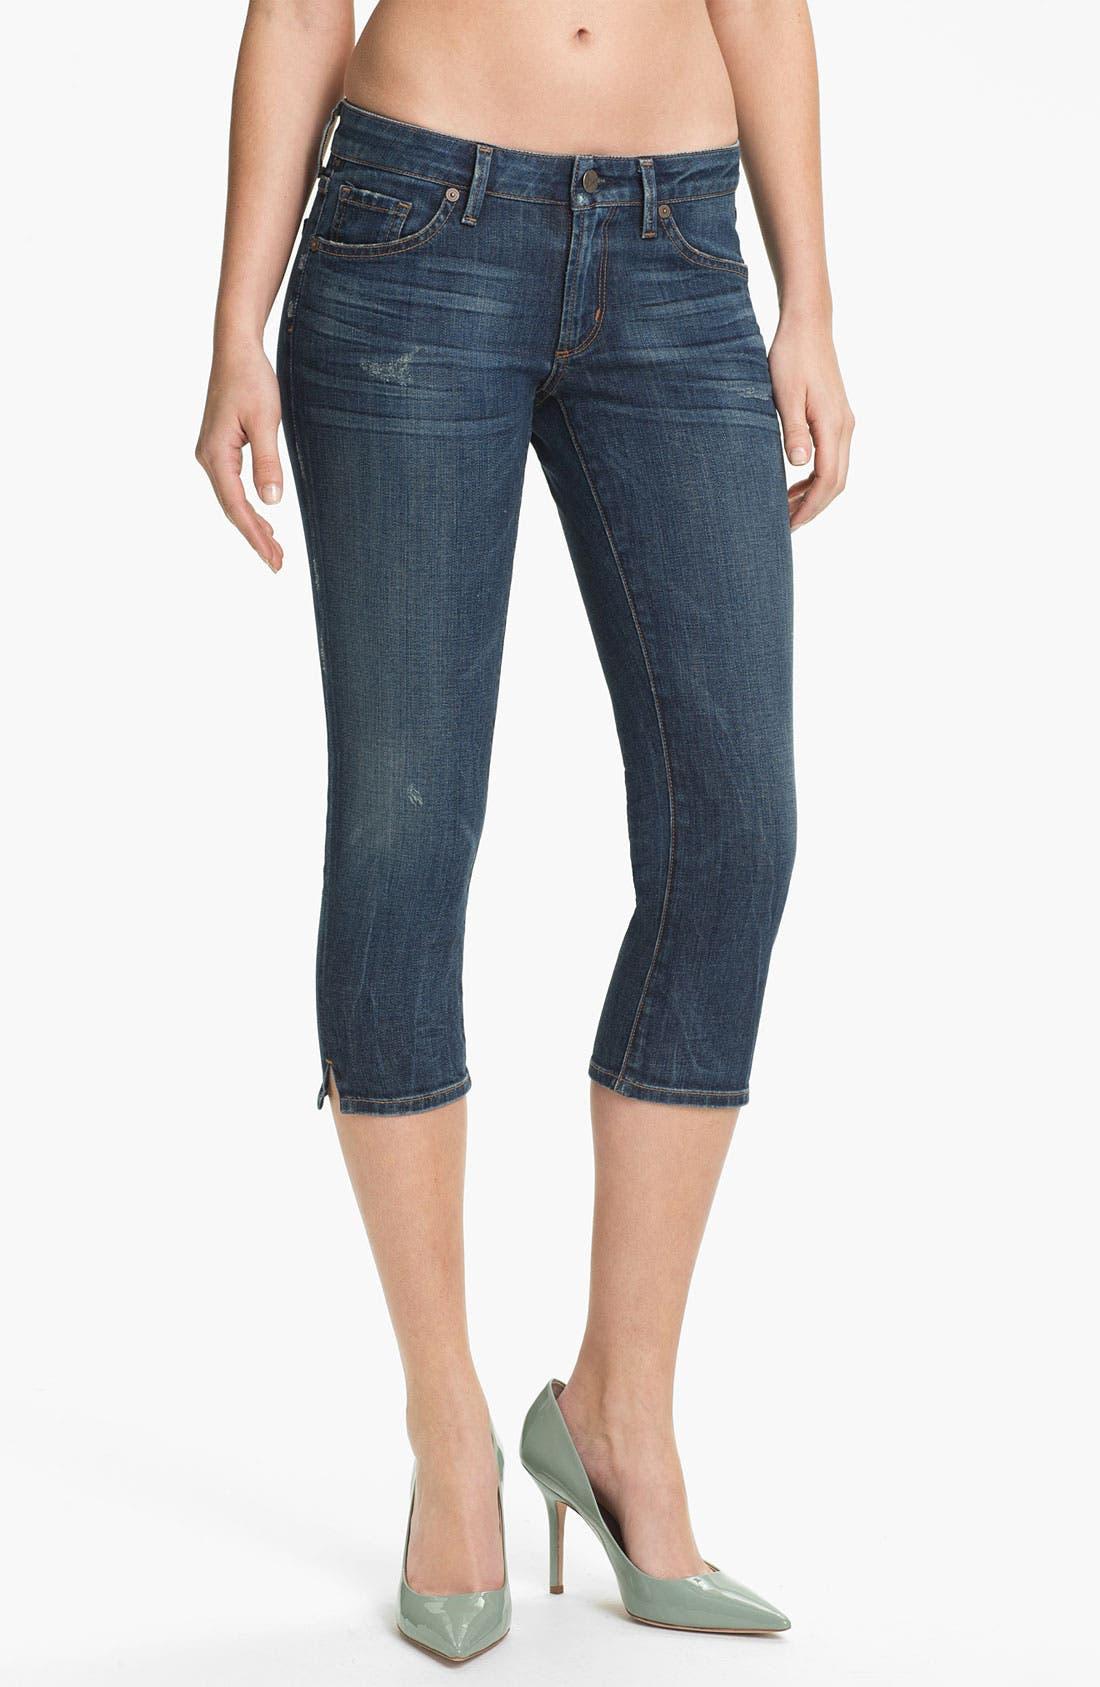 Alternate Image 1 Selected - Citizens of Humanity 'Racer' Crop Skinny Jeans (Slash)